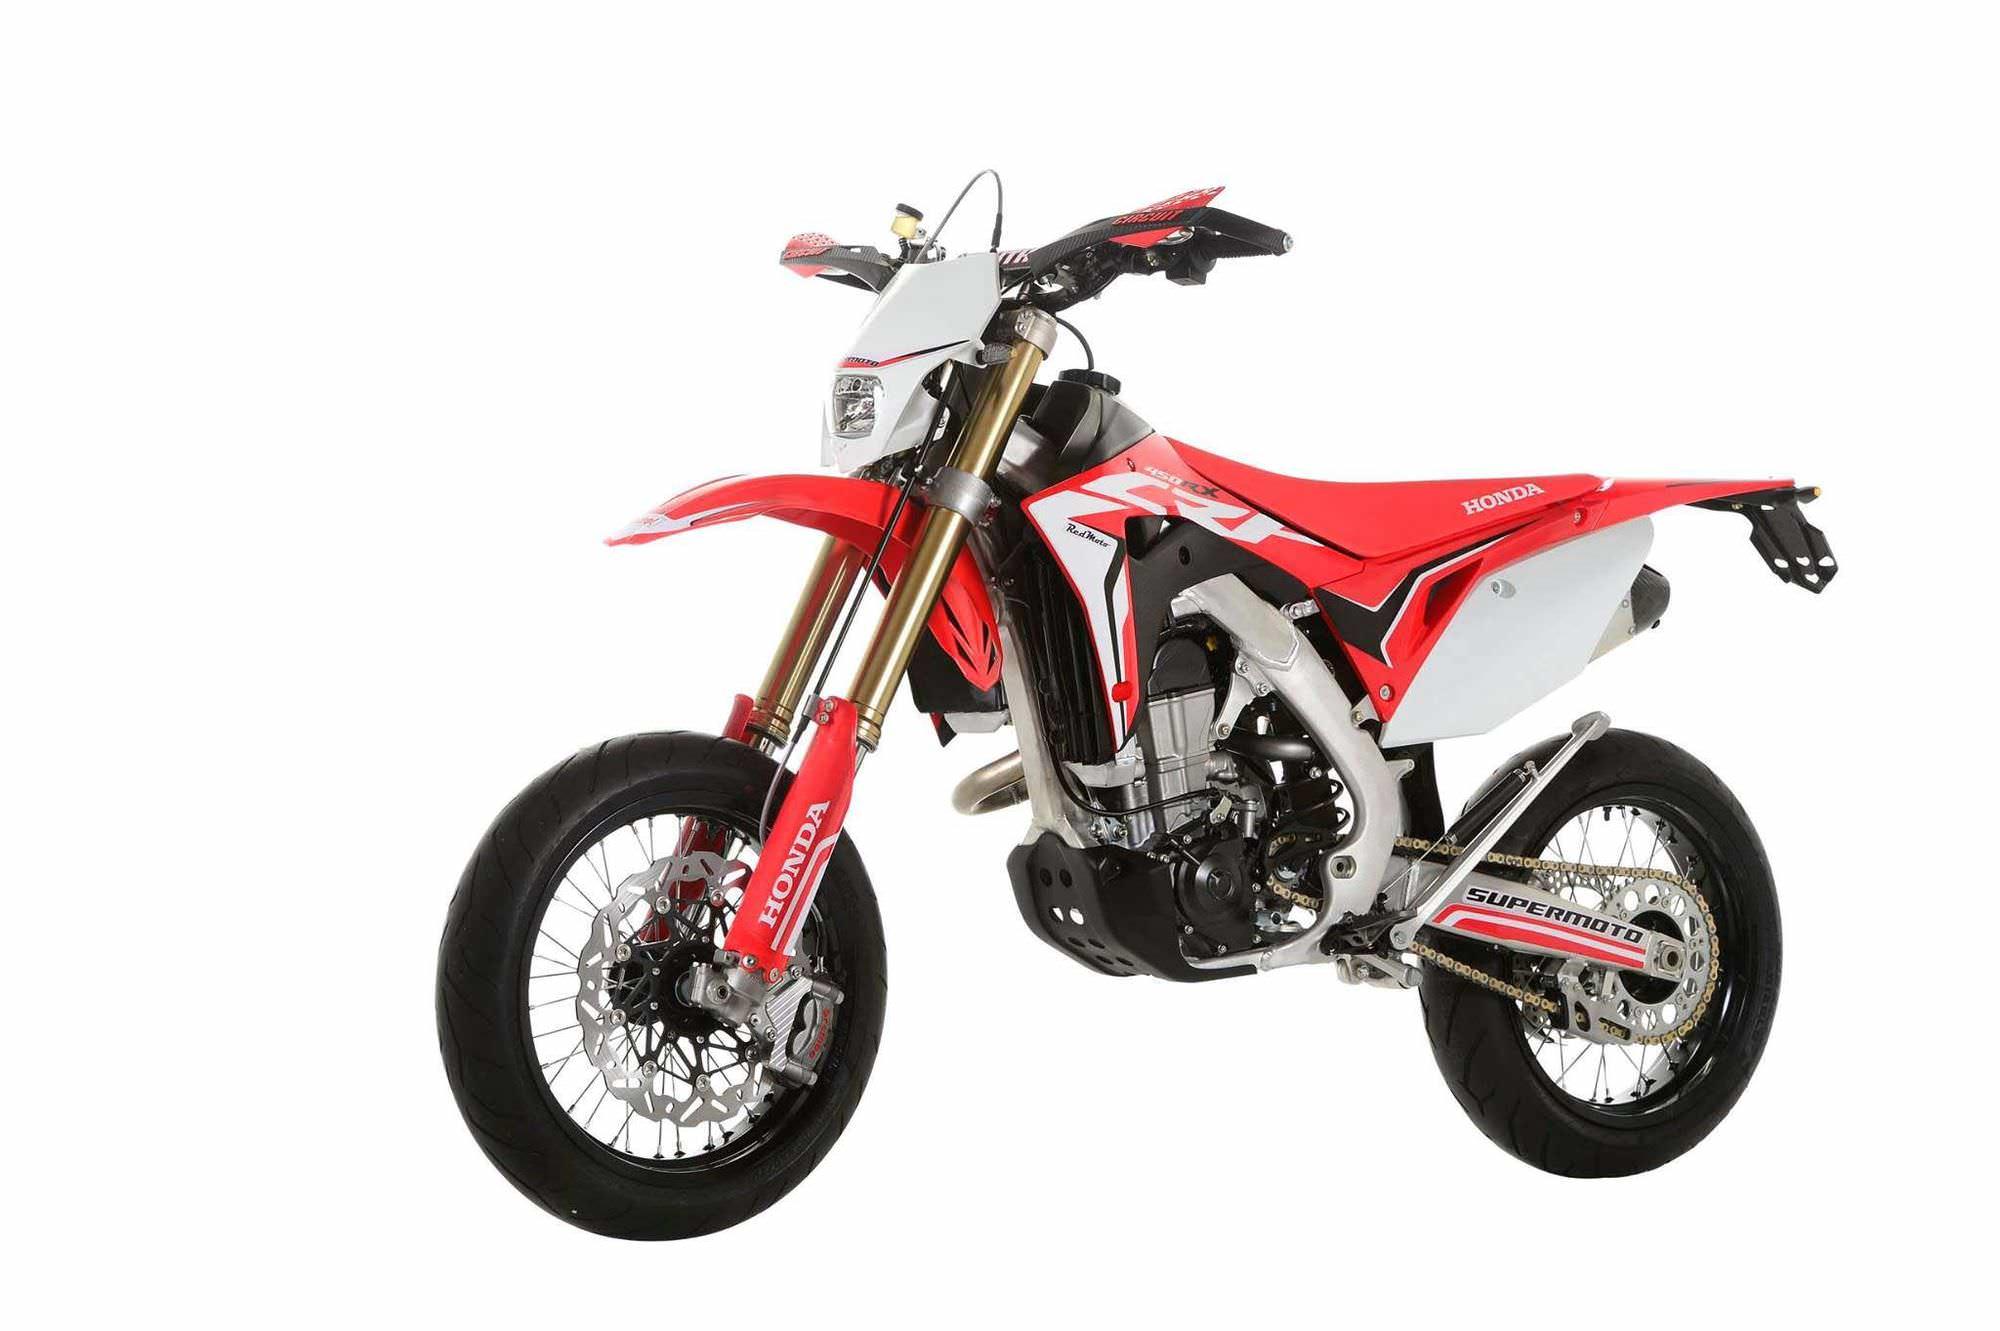 2017 Honda CRF450R SuperMoto Motard Bike / Motorcycle Review & Specs - CRF450R, CRF450X, CRF500R, CRF500X CRF Models